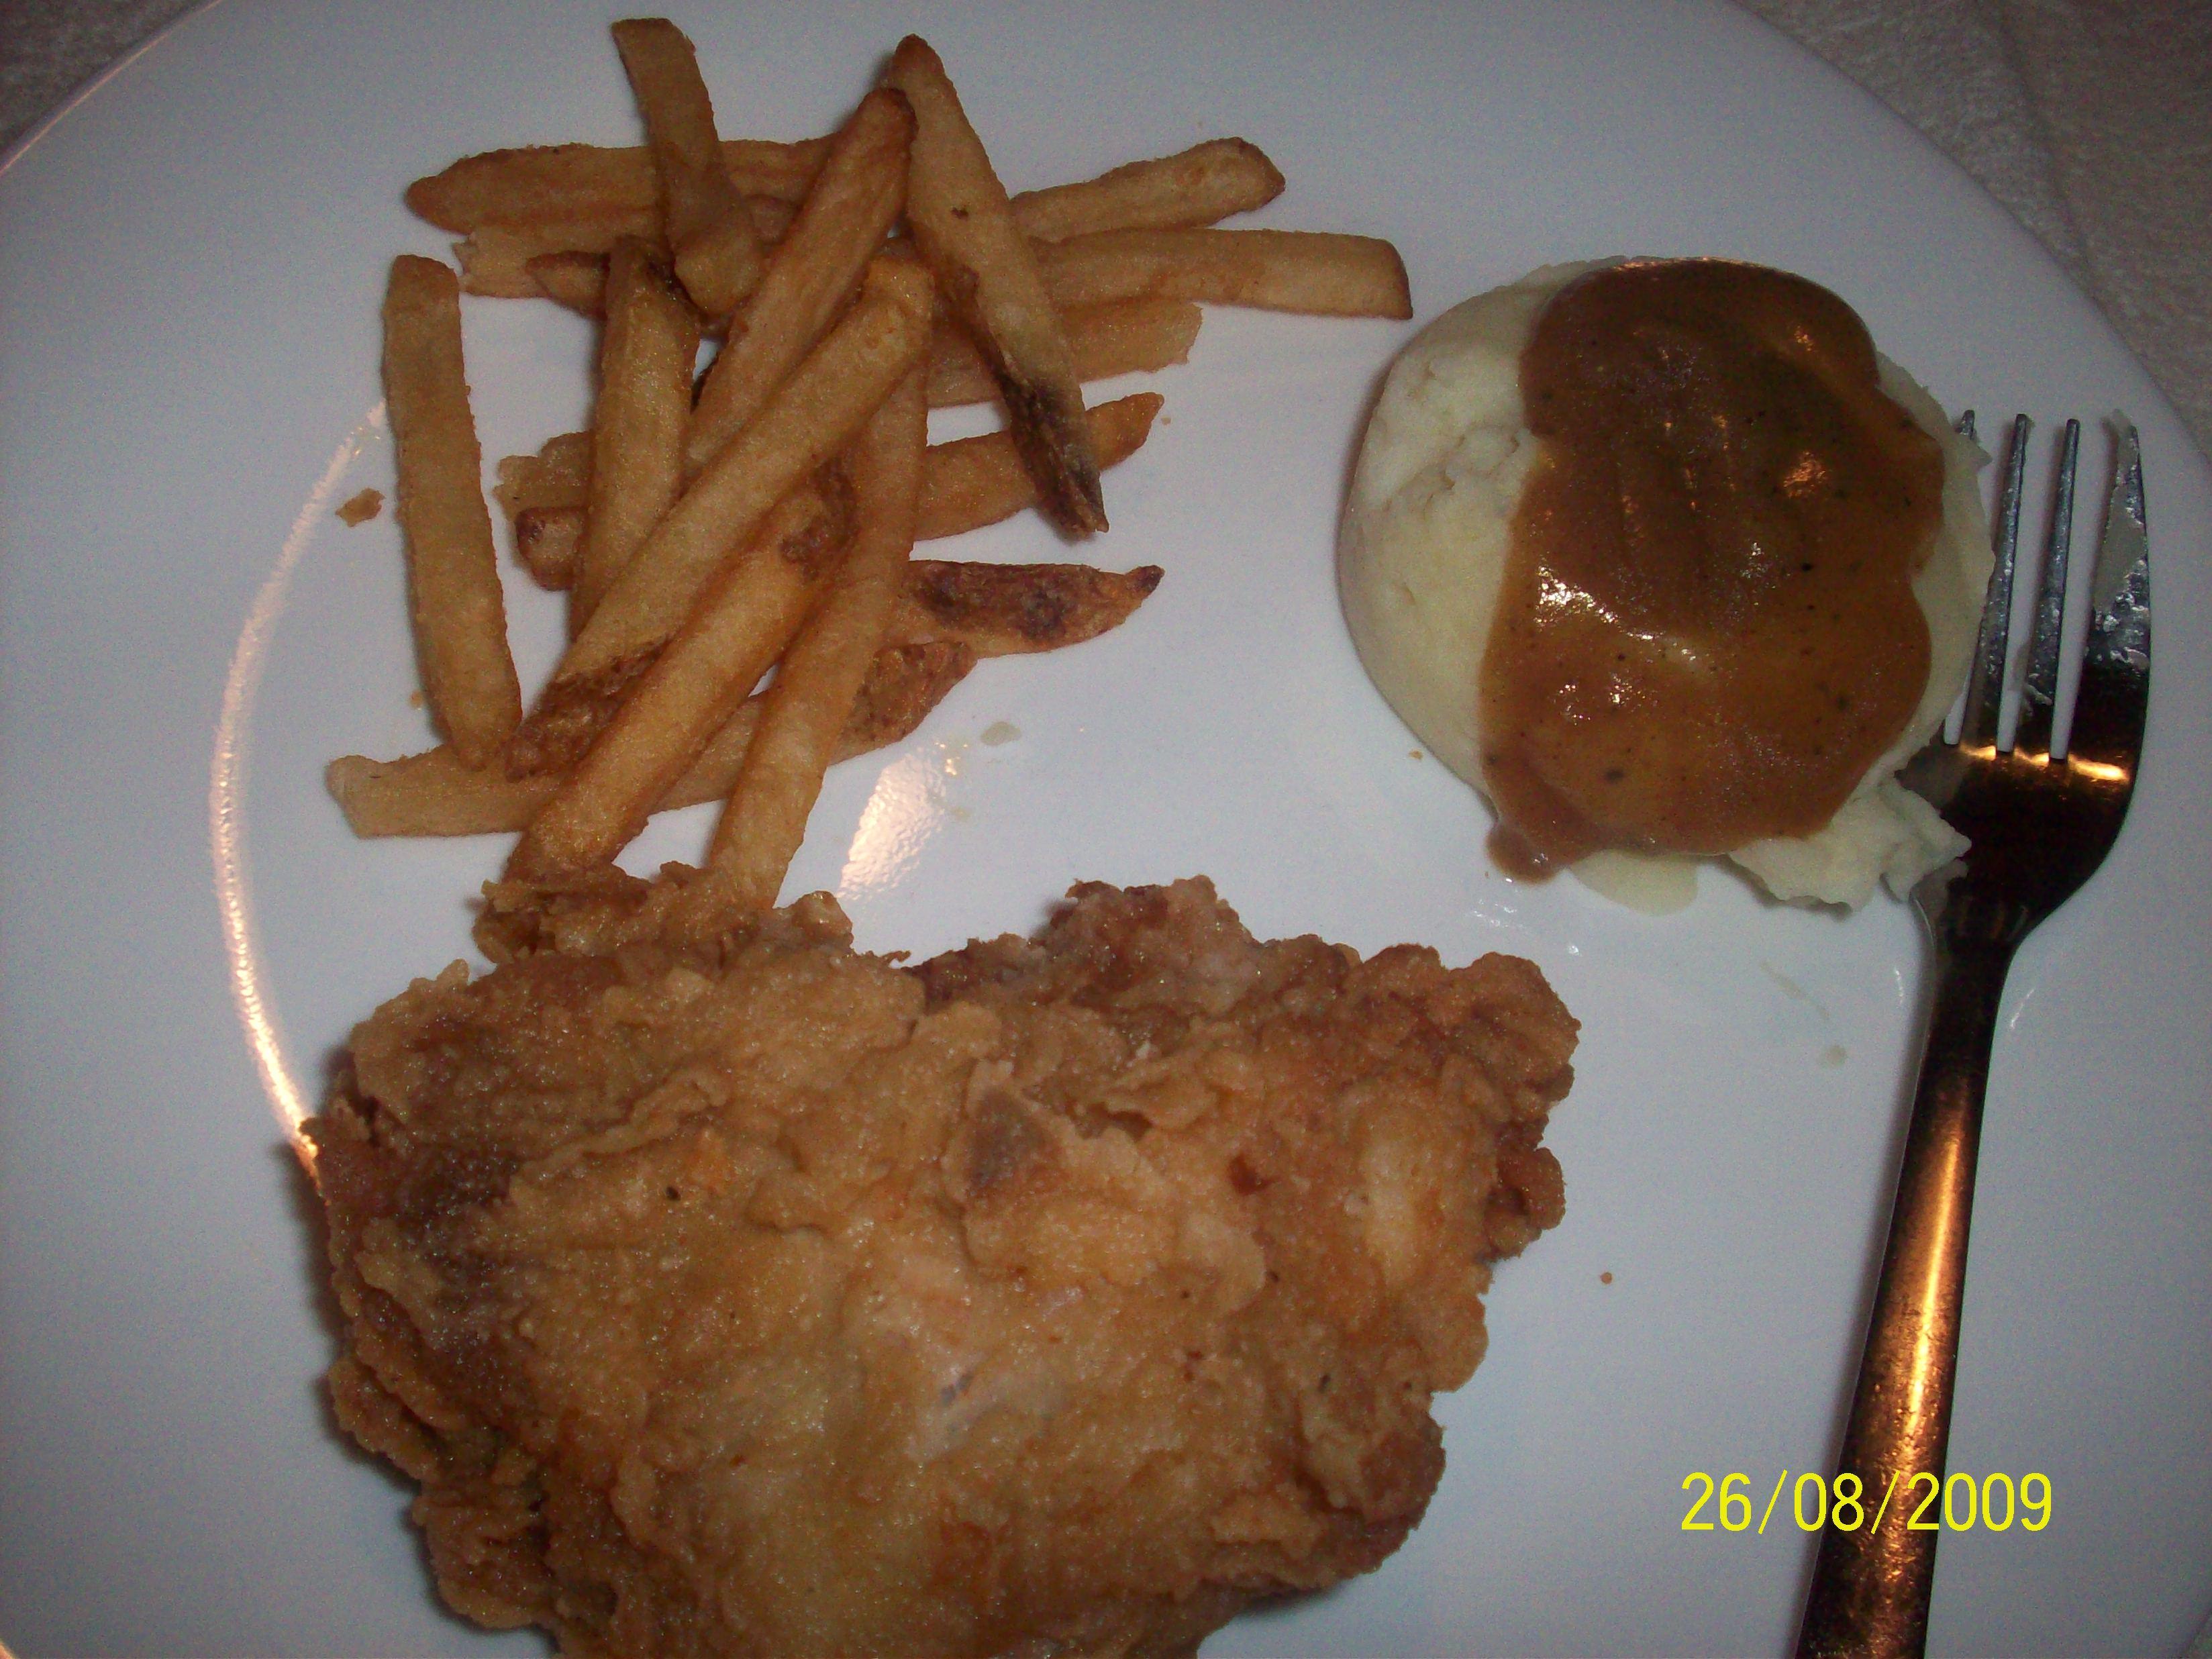 http://foodloader.net/cutie_2009-08-26_KFC_Chicken__Fries_and_Mashed_Potato.jpg